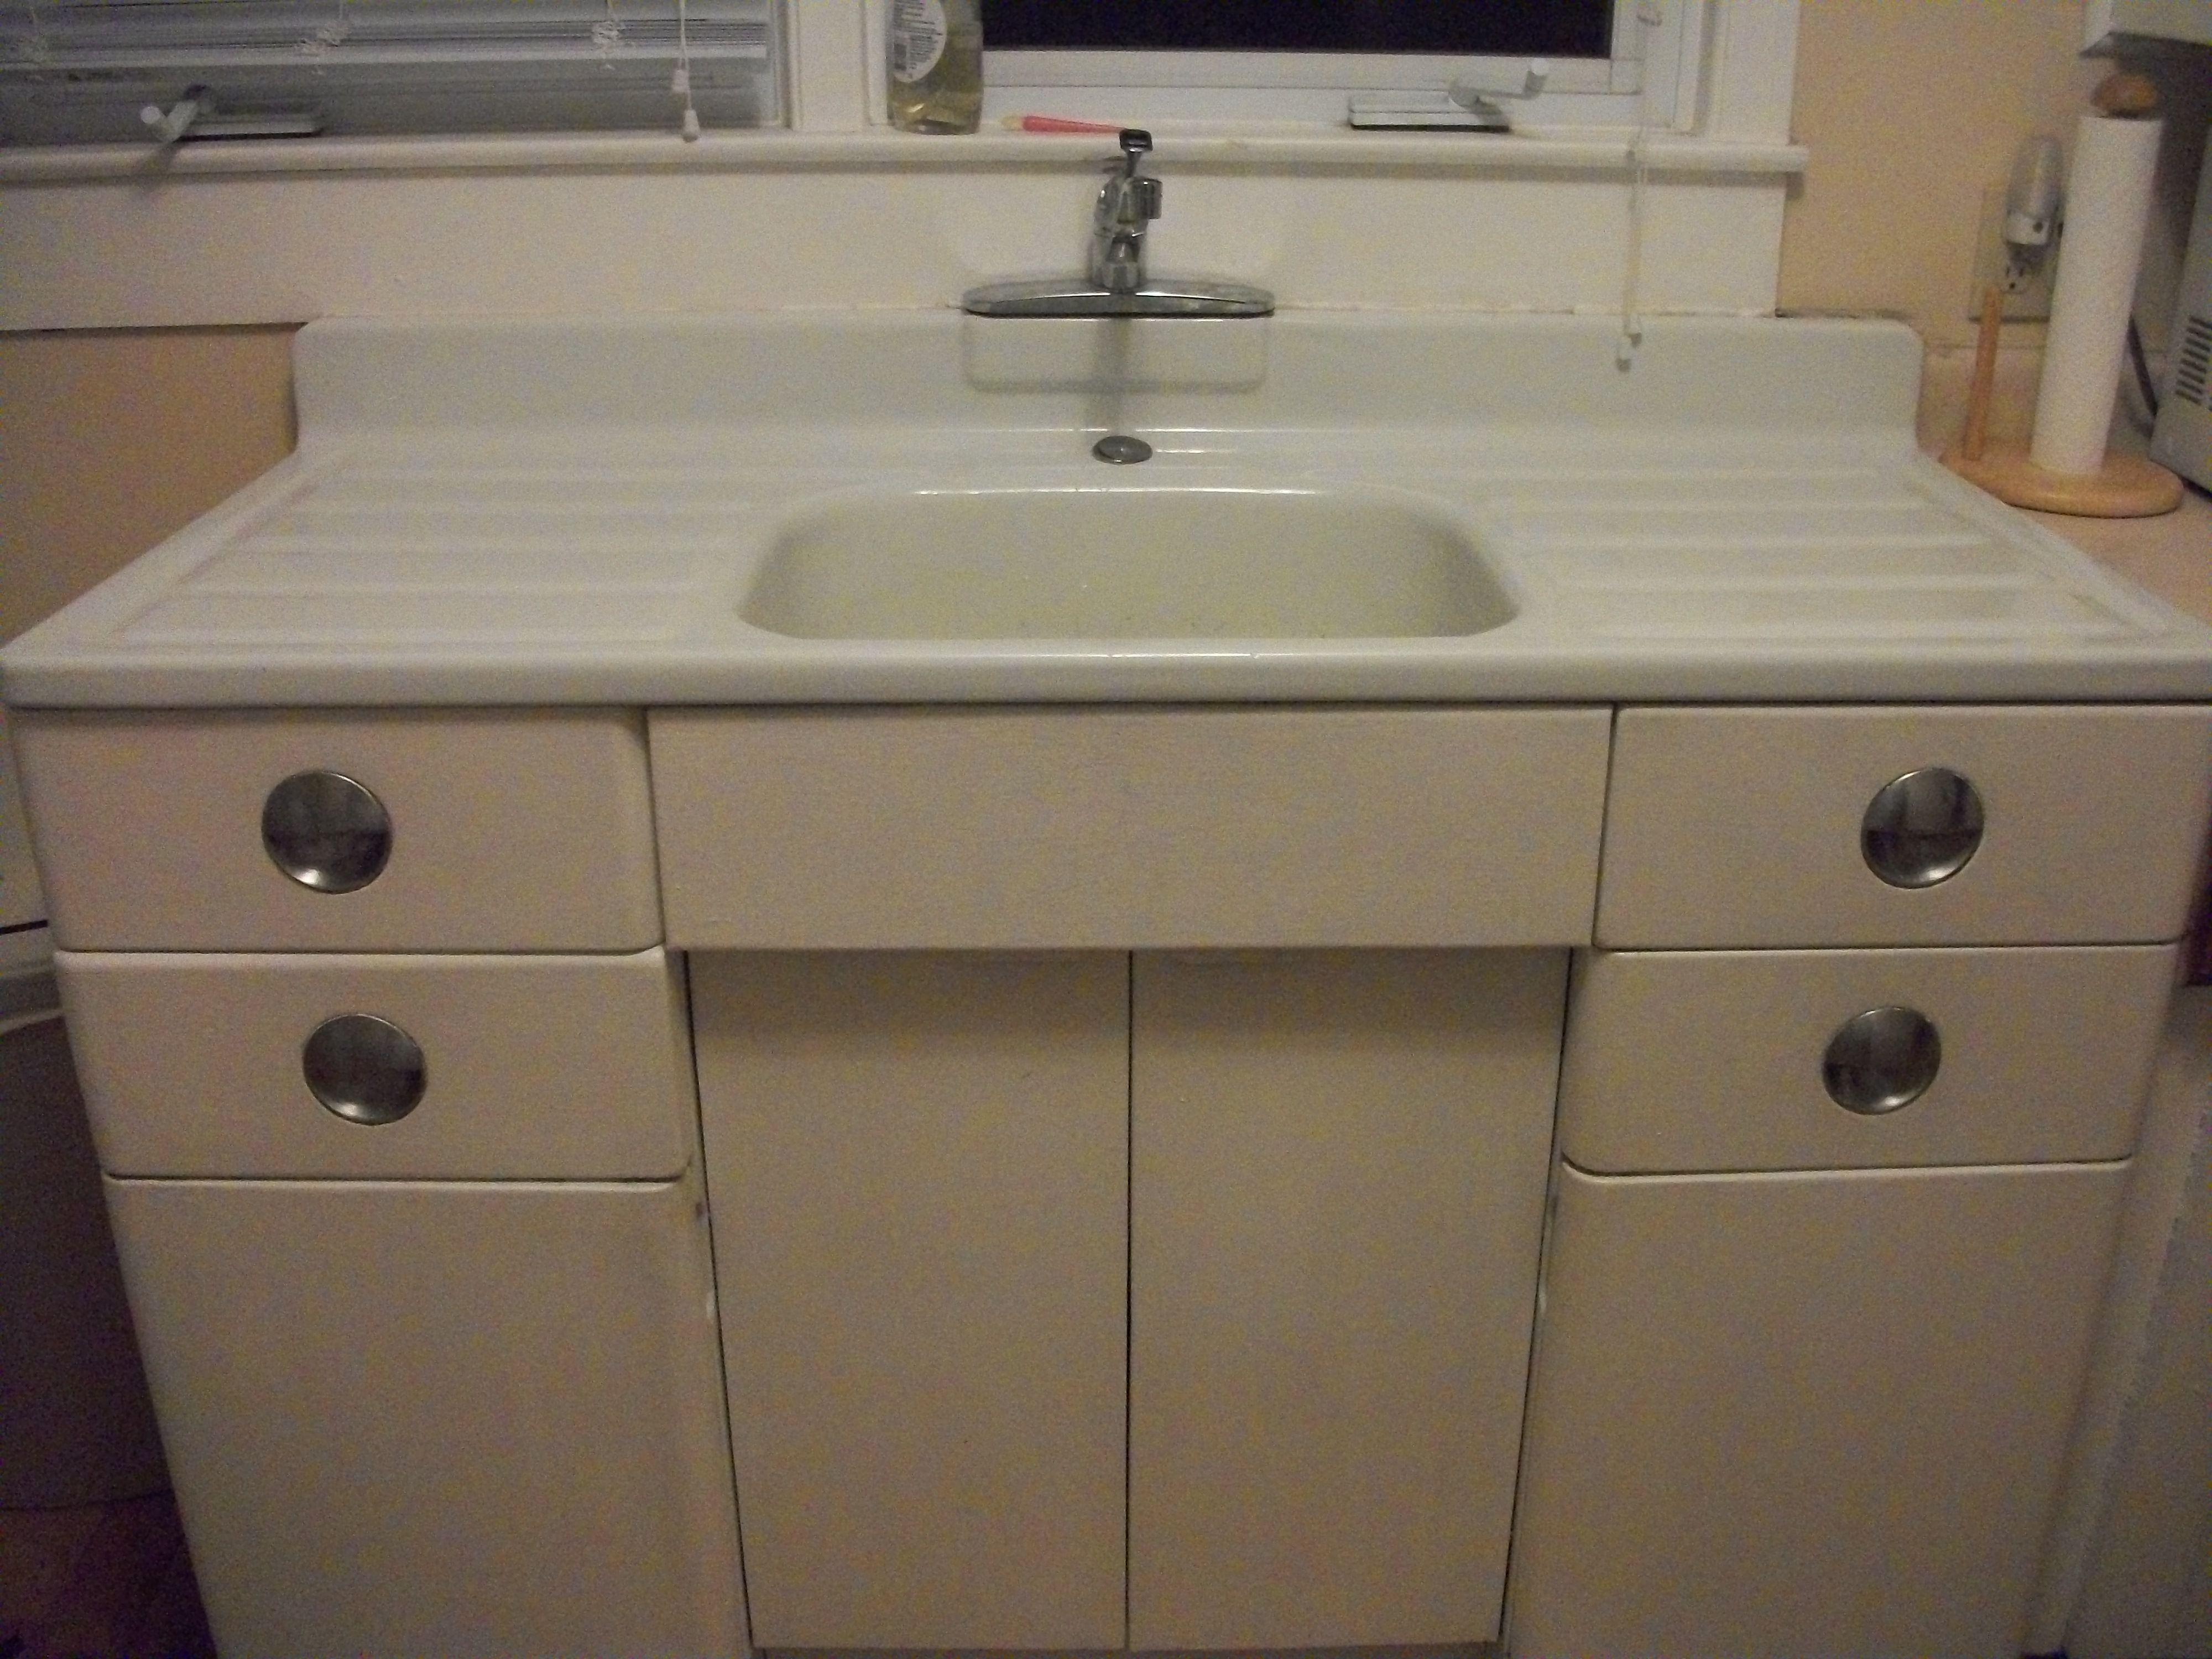 Metal Kitchen and Porcelain Sink For Sale